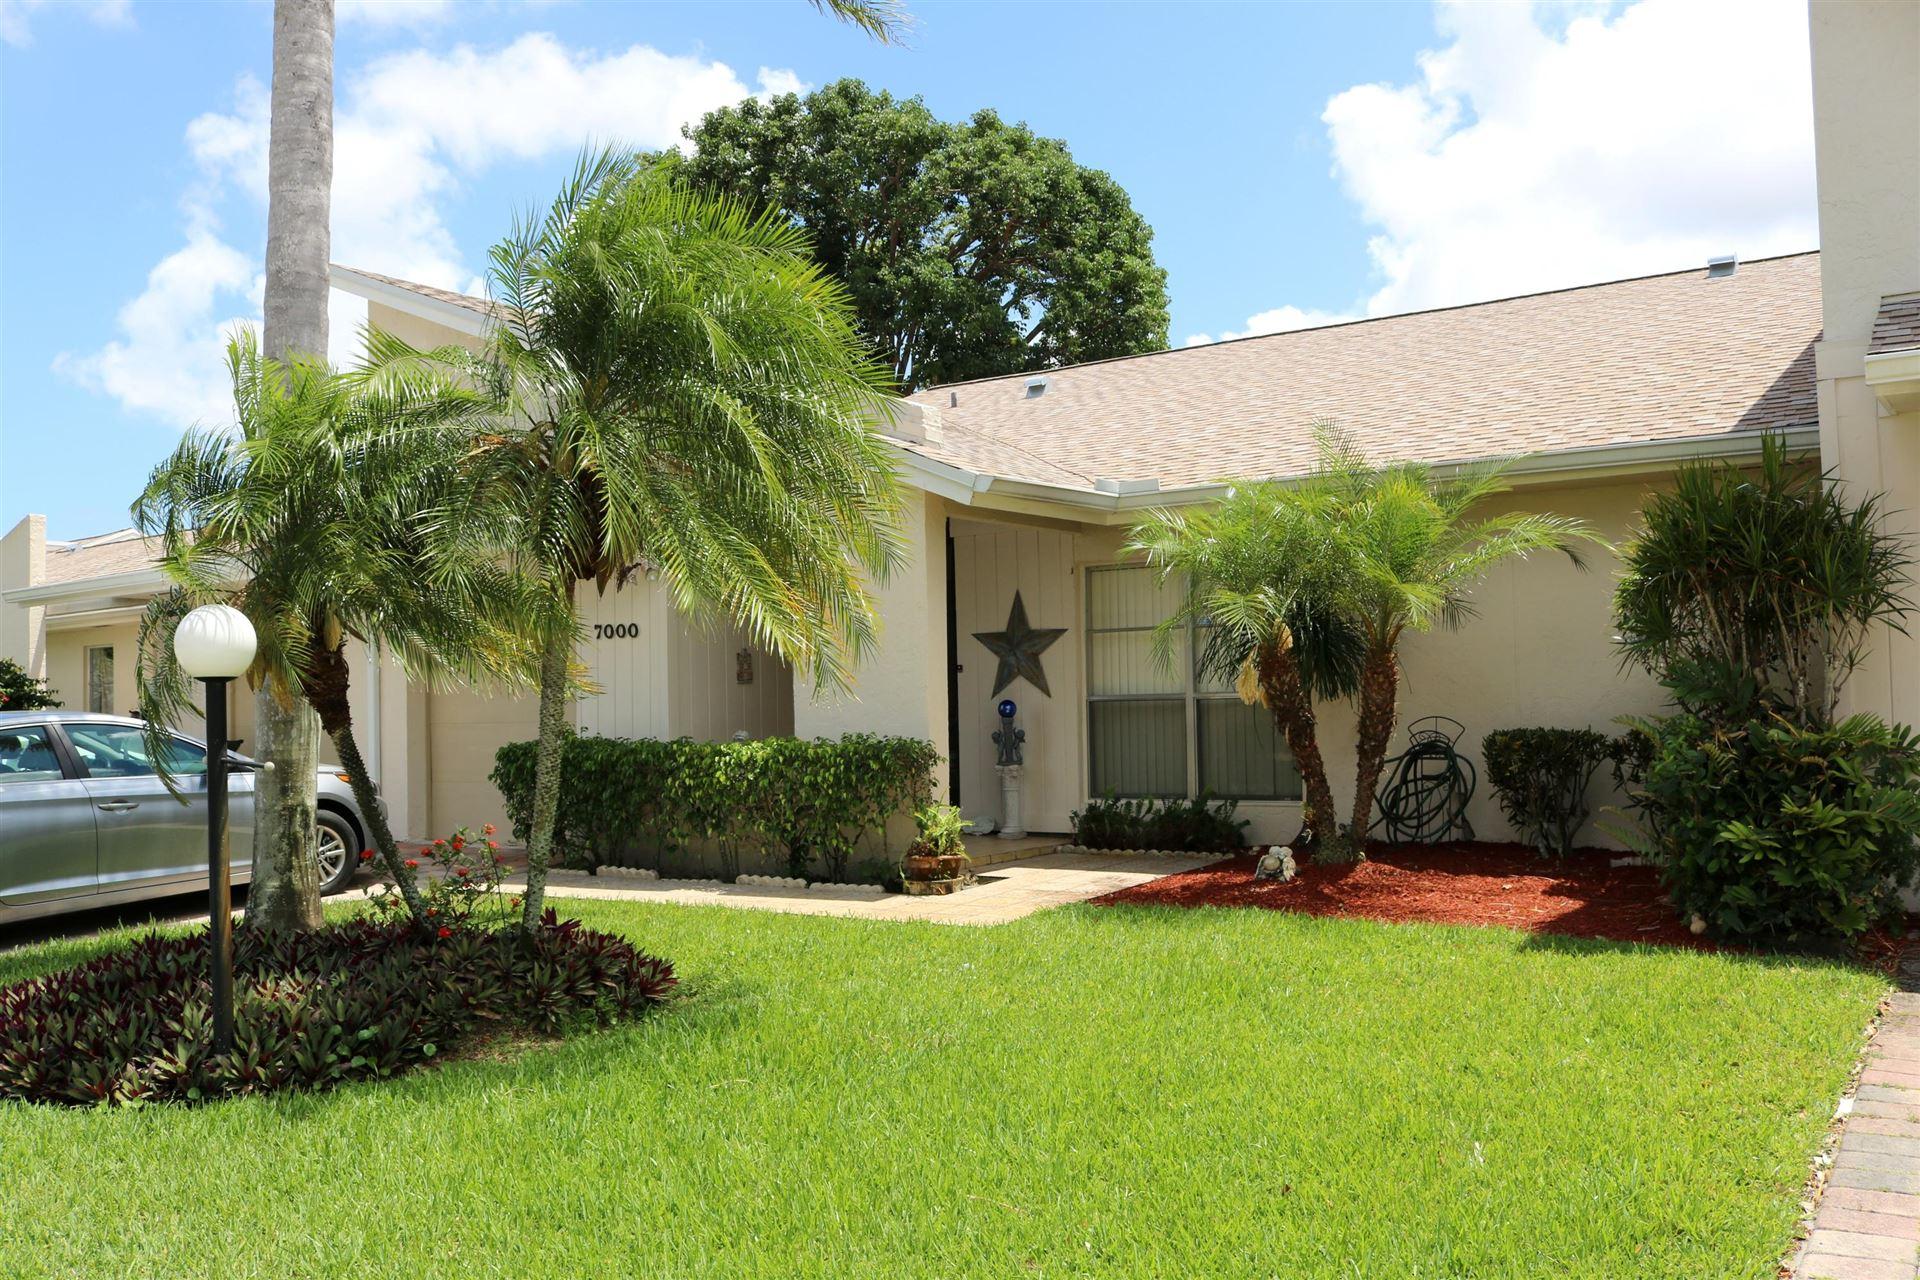 7000 Peony Place, Lake Worth, FL 33467 - MLS#: RX-10712173